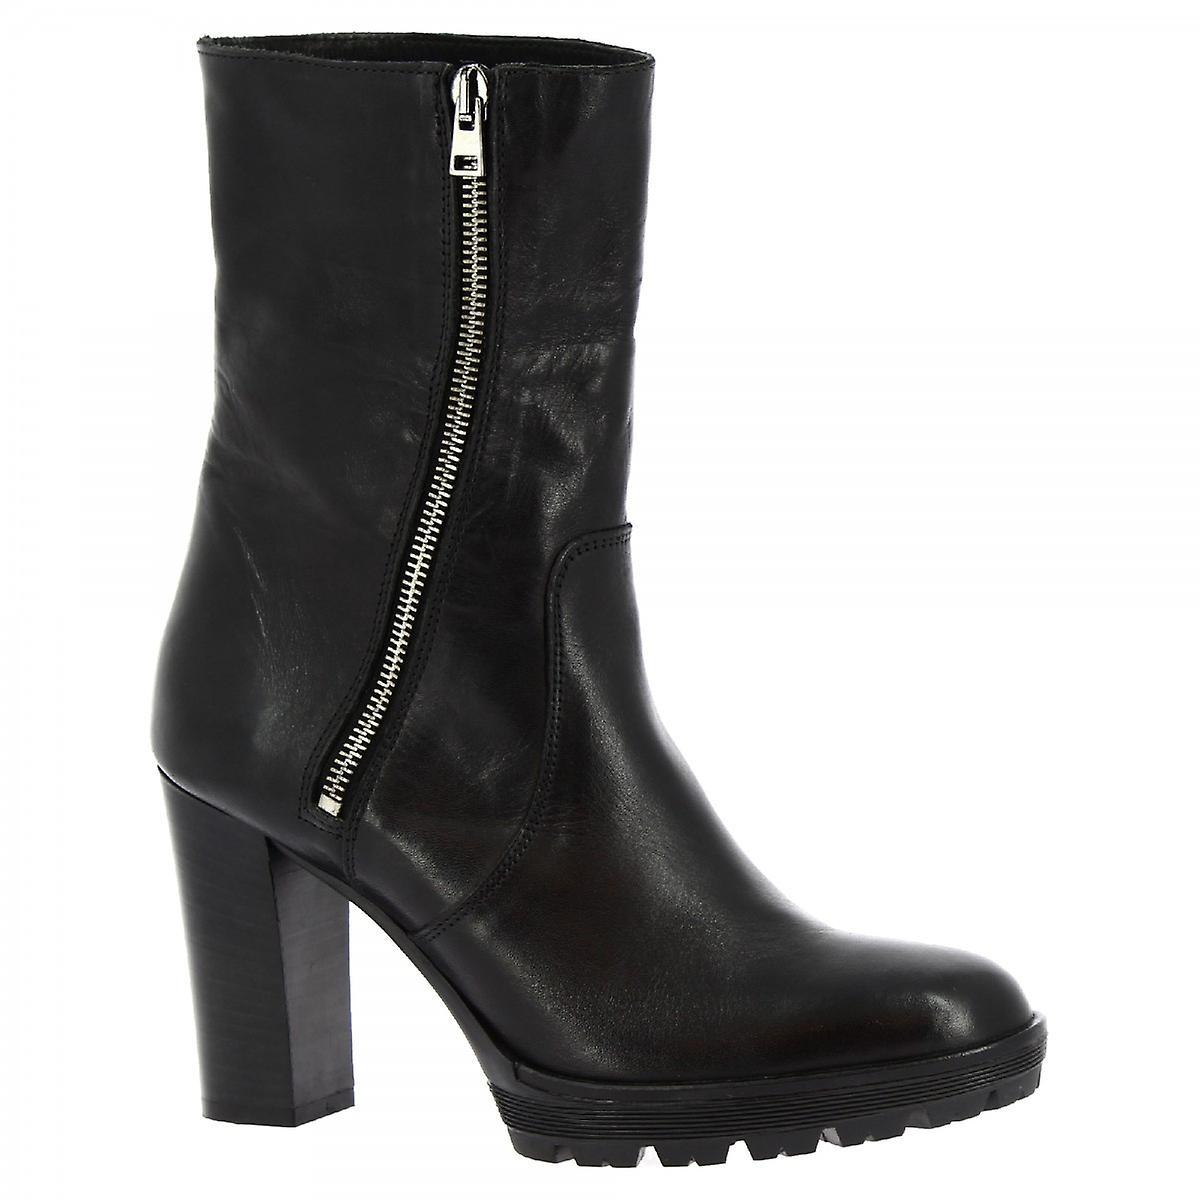 Leonardo Shoes Women's handmade heels mid calf boots black calf leather side zip BEyTE